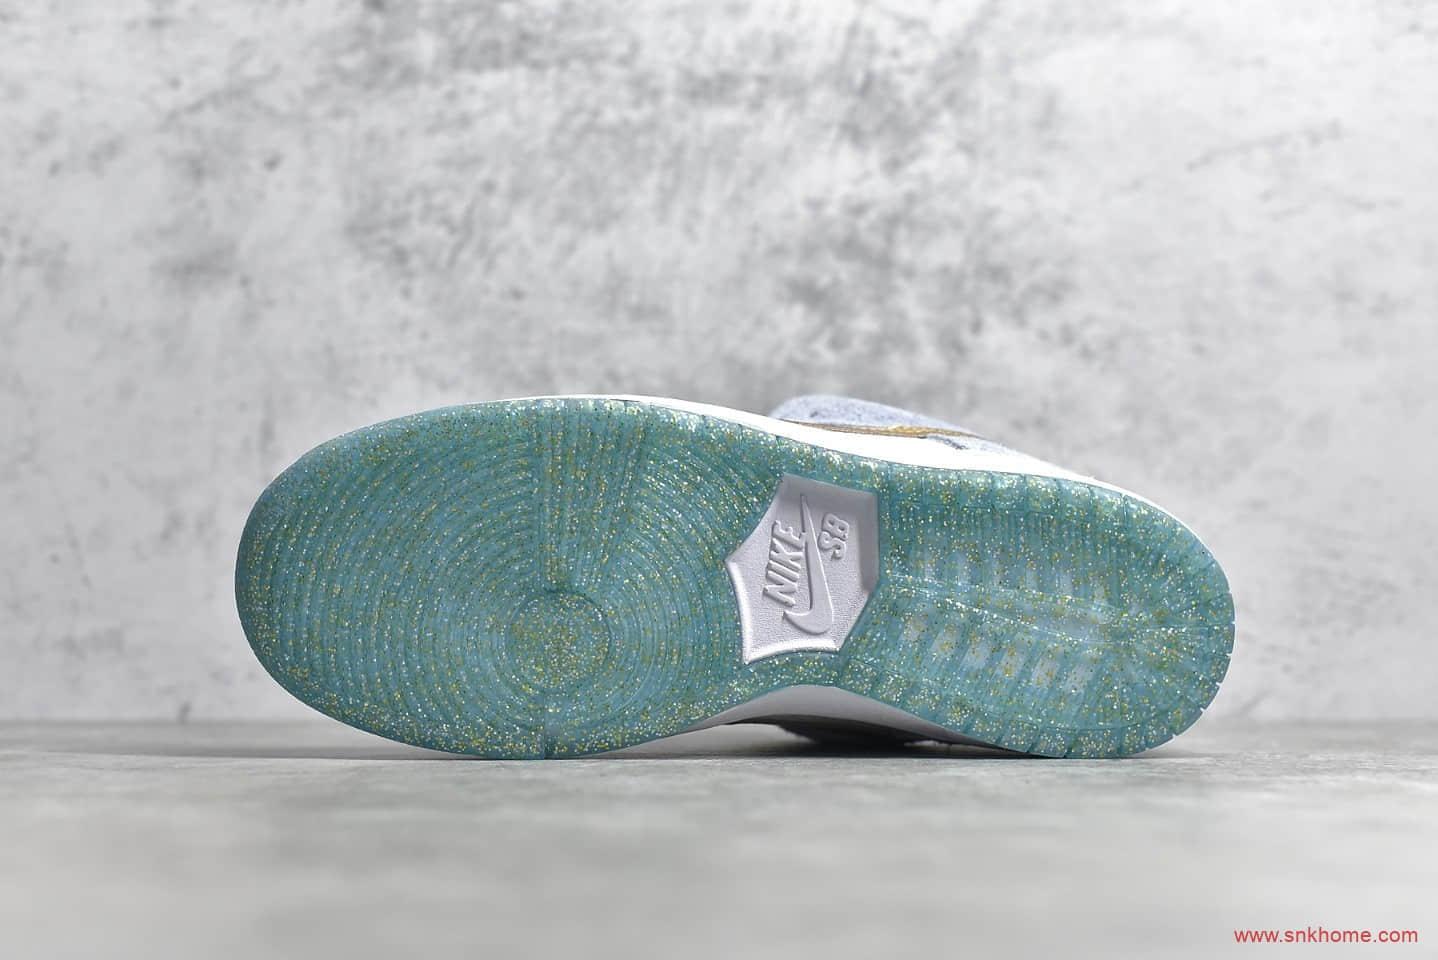 耐克SB Dunk冰雪奇缘 Sean Cliver x NIKE SB Dunk Low Pro QS 耐克联名款滑板鞋 货号:DC9936-100-潮流者之家